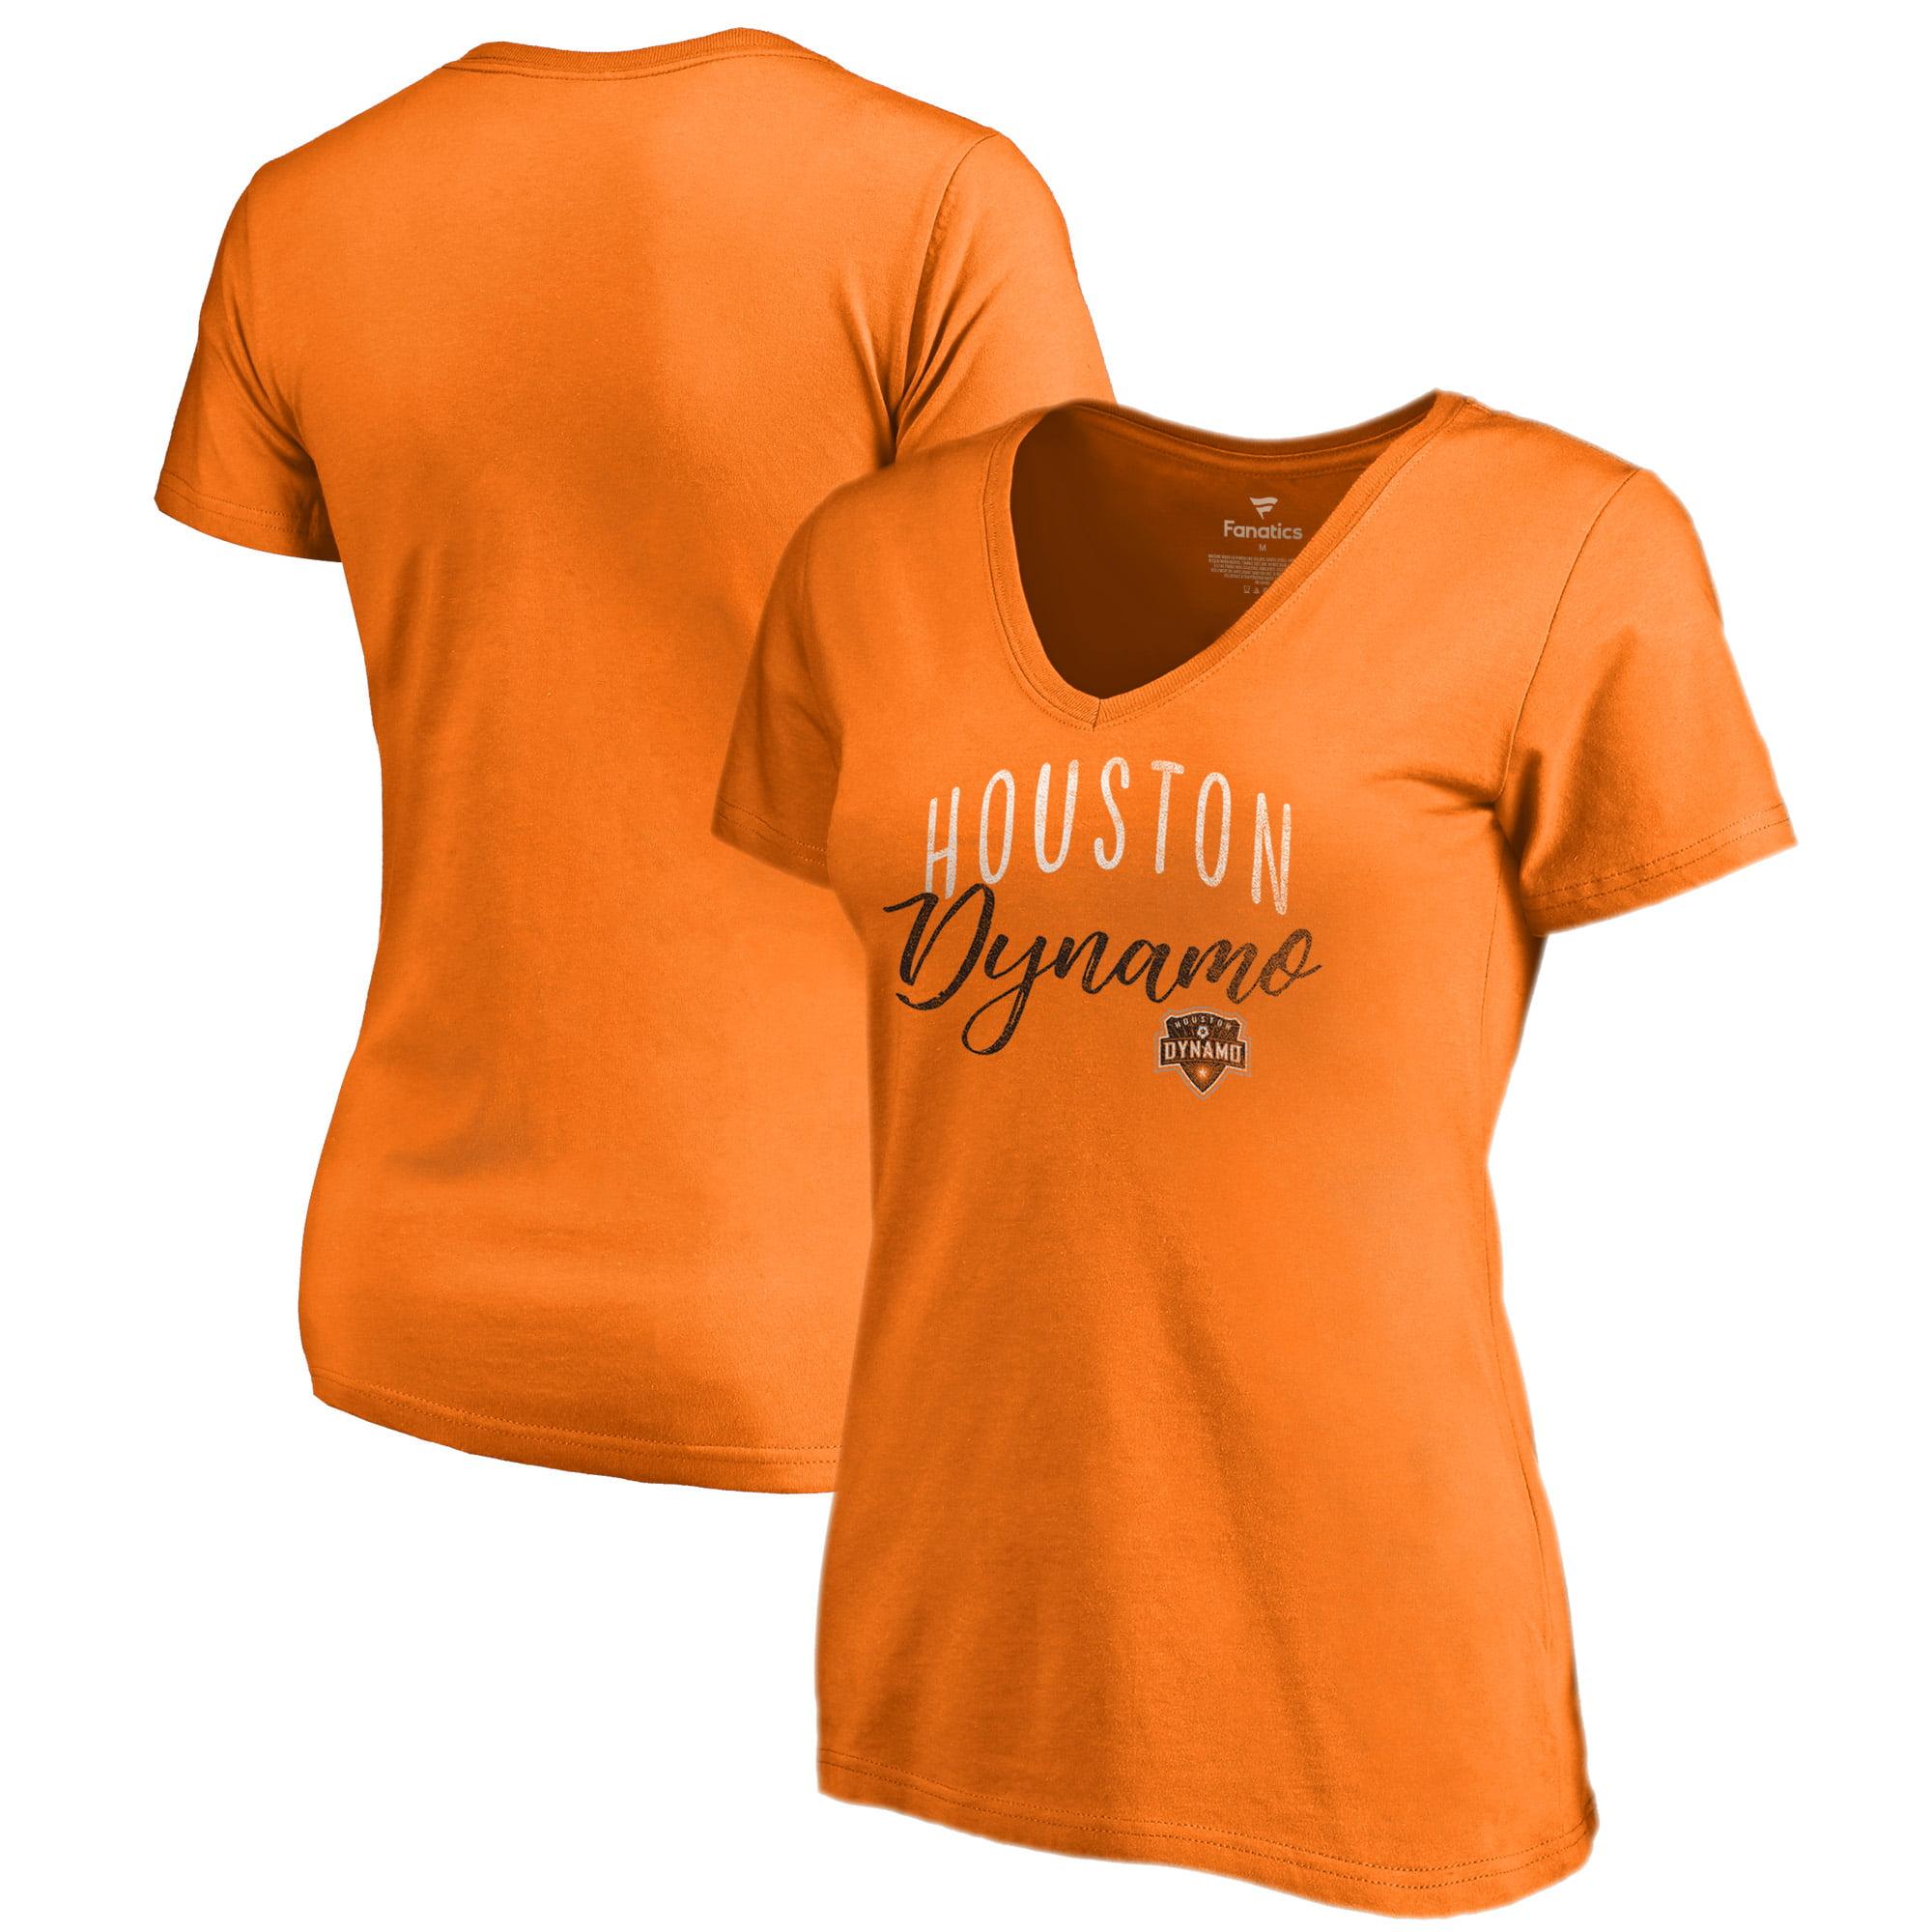 Houston Dynamo Fanatics Branded Women's Graceful V-Neck T-Shirt - Orange